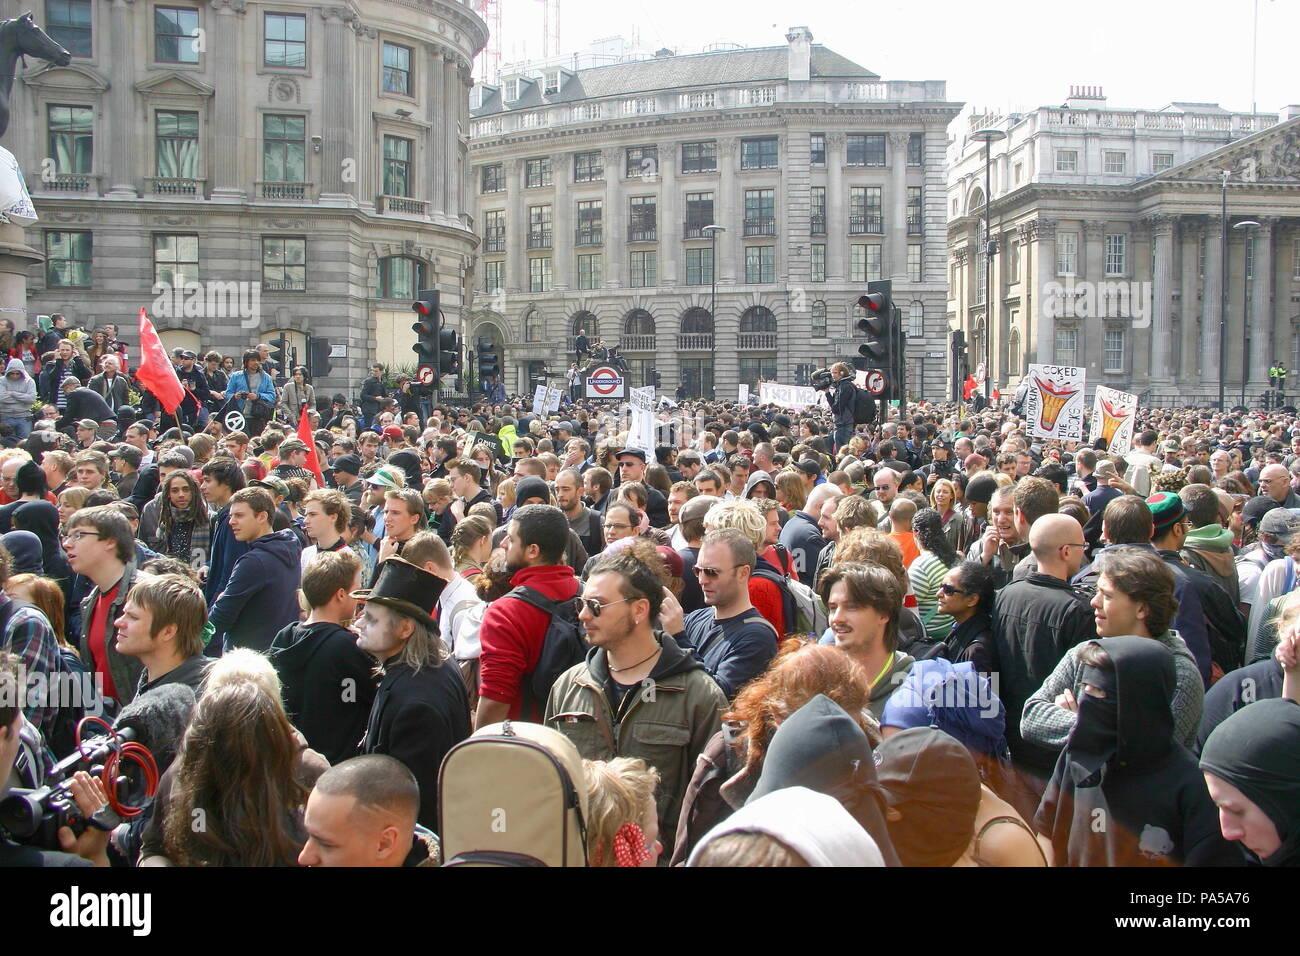 Anti Capitalist demonstration at Bank, City of London, UK. - Stock Image